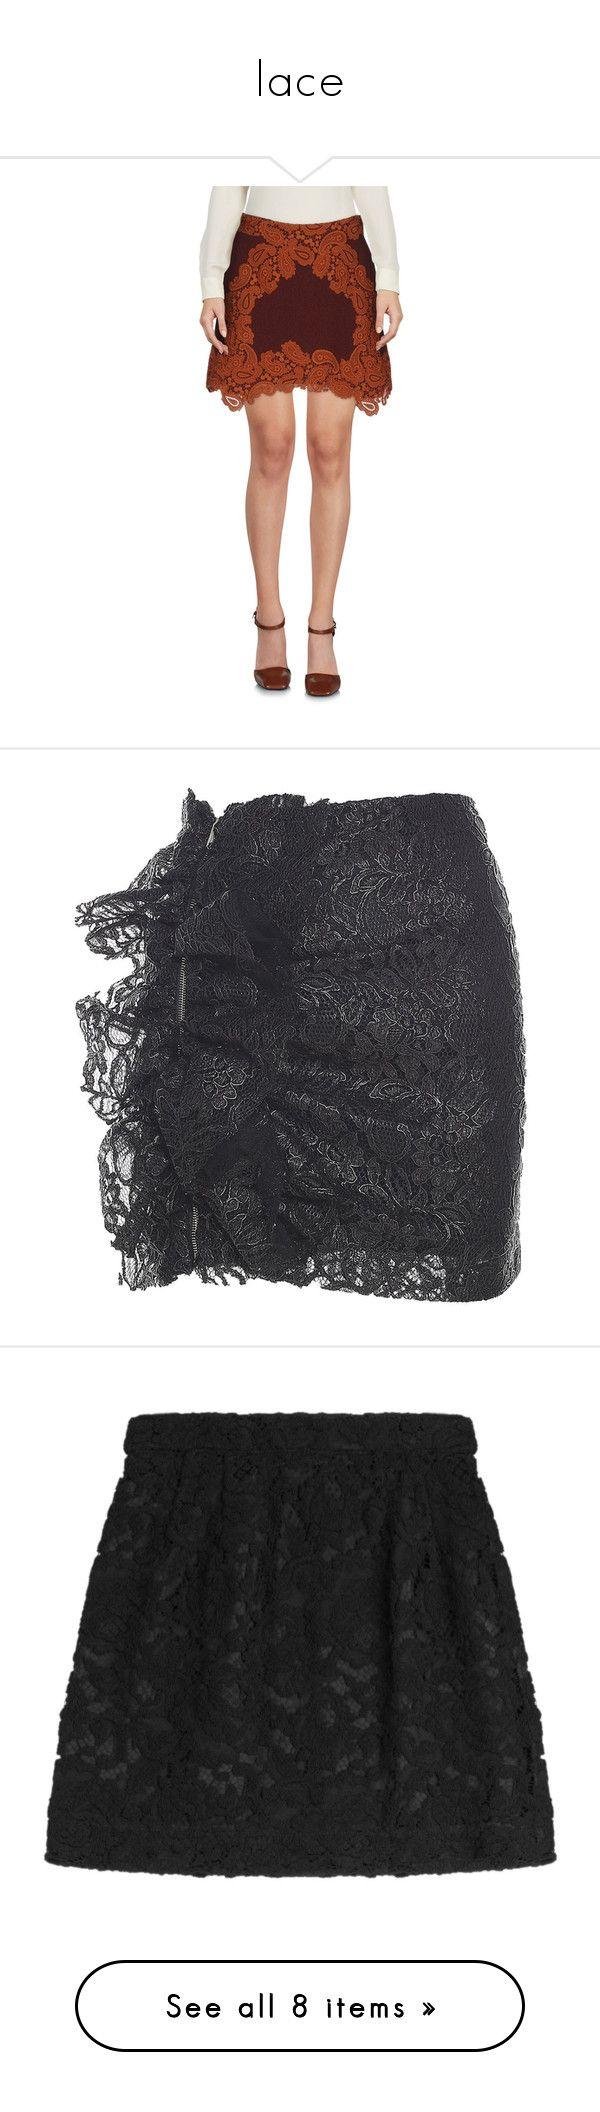 """lace"" by jeniferkcarsrud ❤ liked on Polyvore featuring skirts, mini skirts, cocoa, short skirts, zip skirt, lacy skirt, short lace skirt, lace mini skirt, nero and lace skirts"